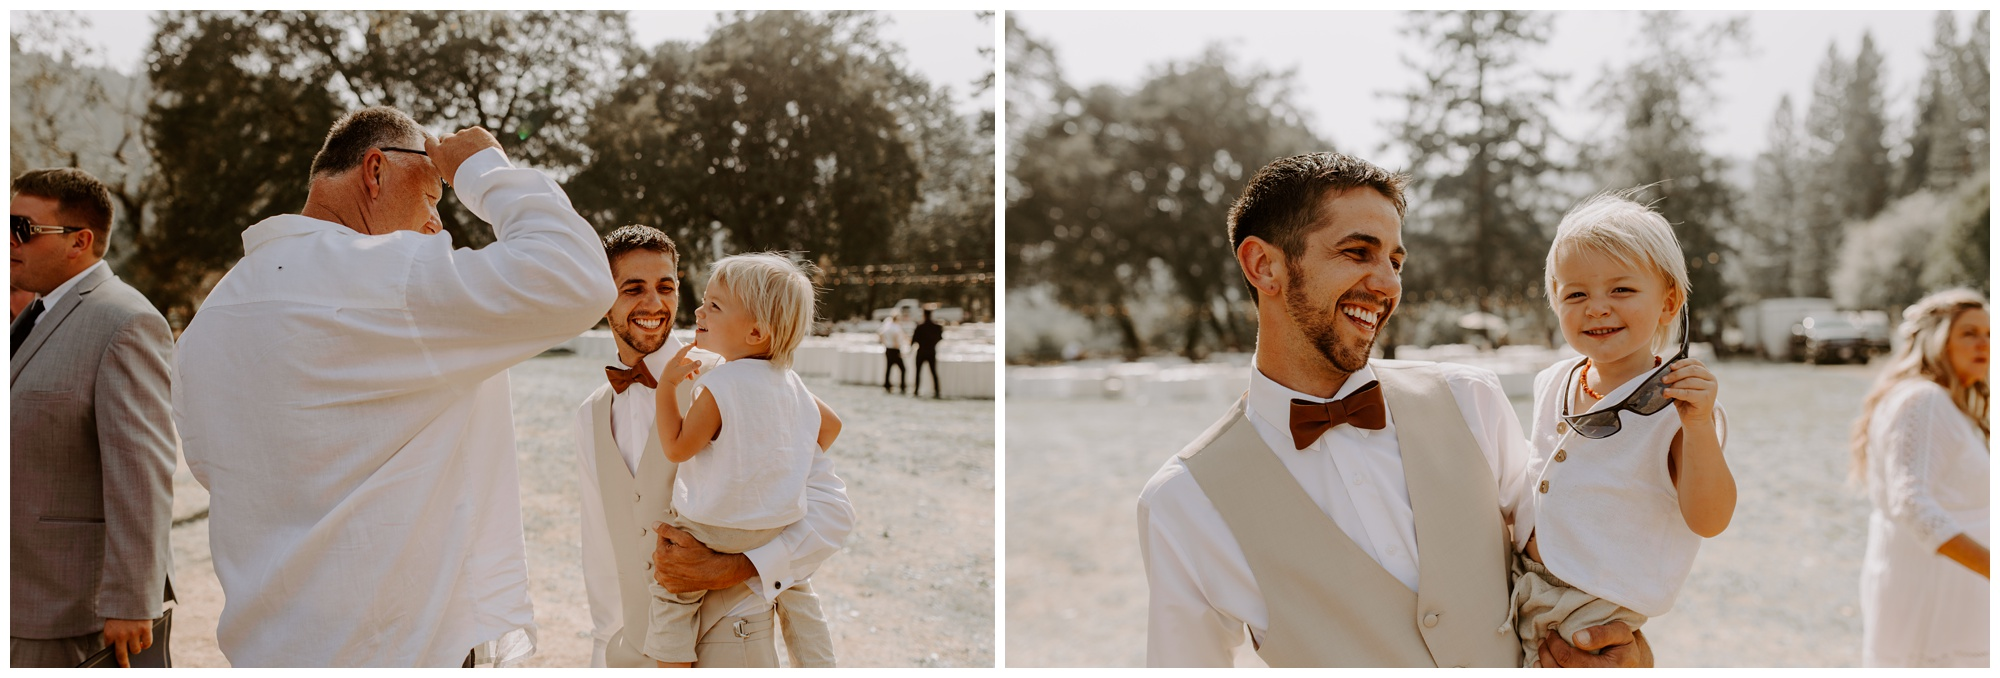 Redwood Festival Wedding Humbolt California - Jessica Heron Images_0014.jpg